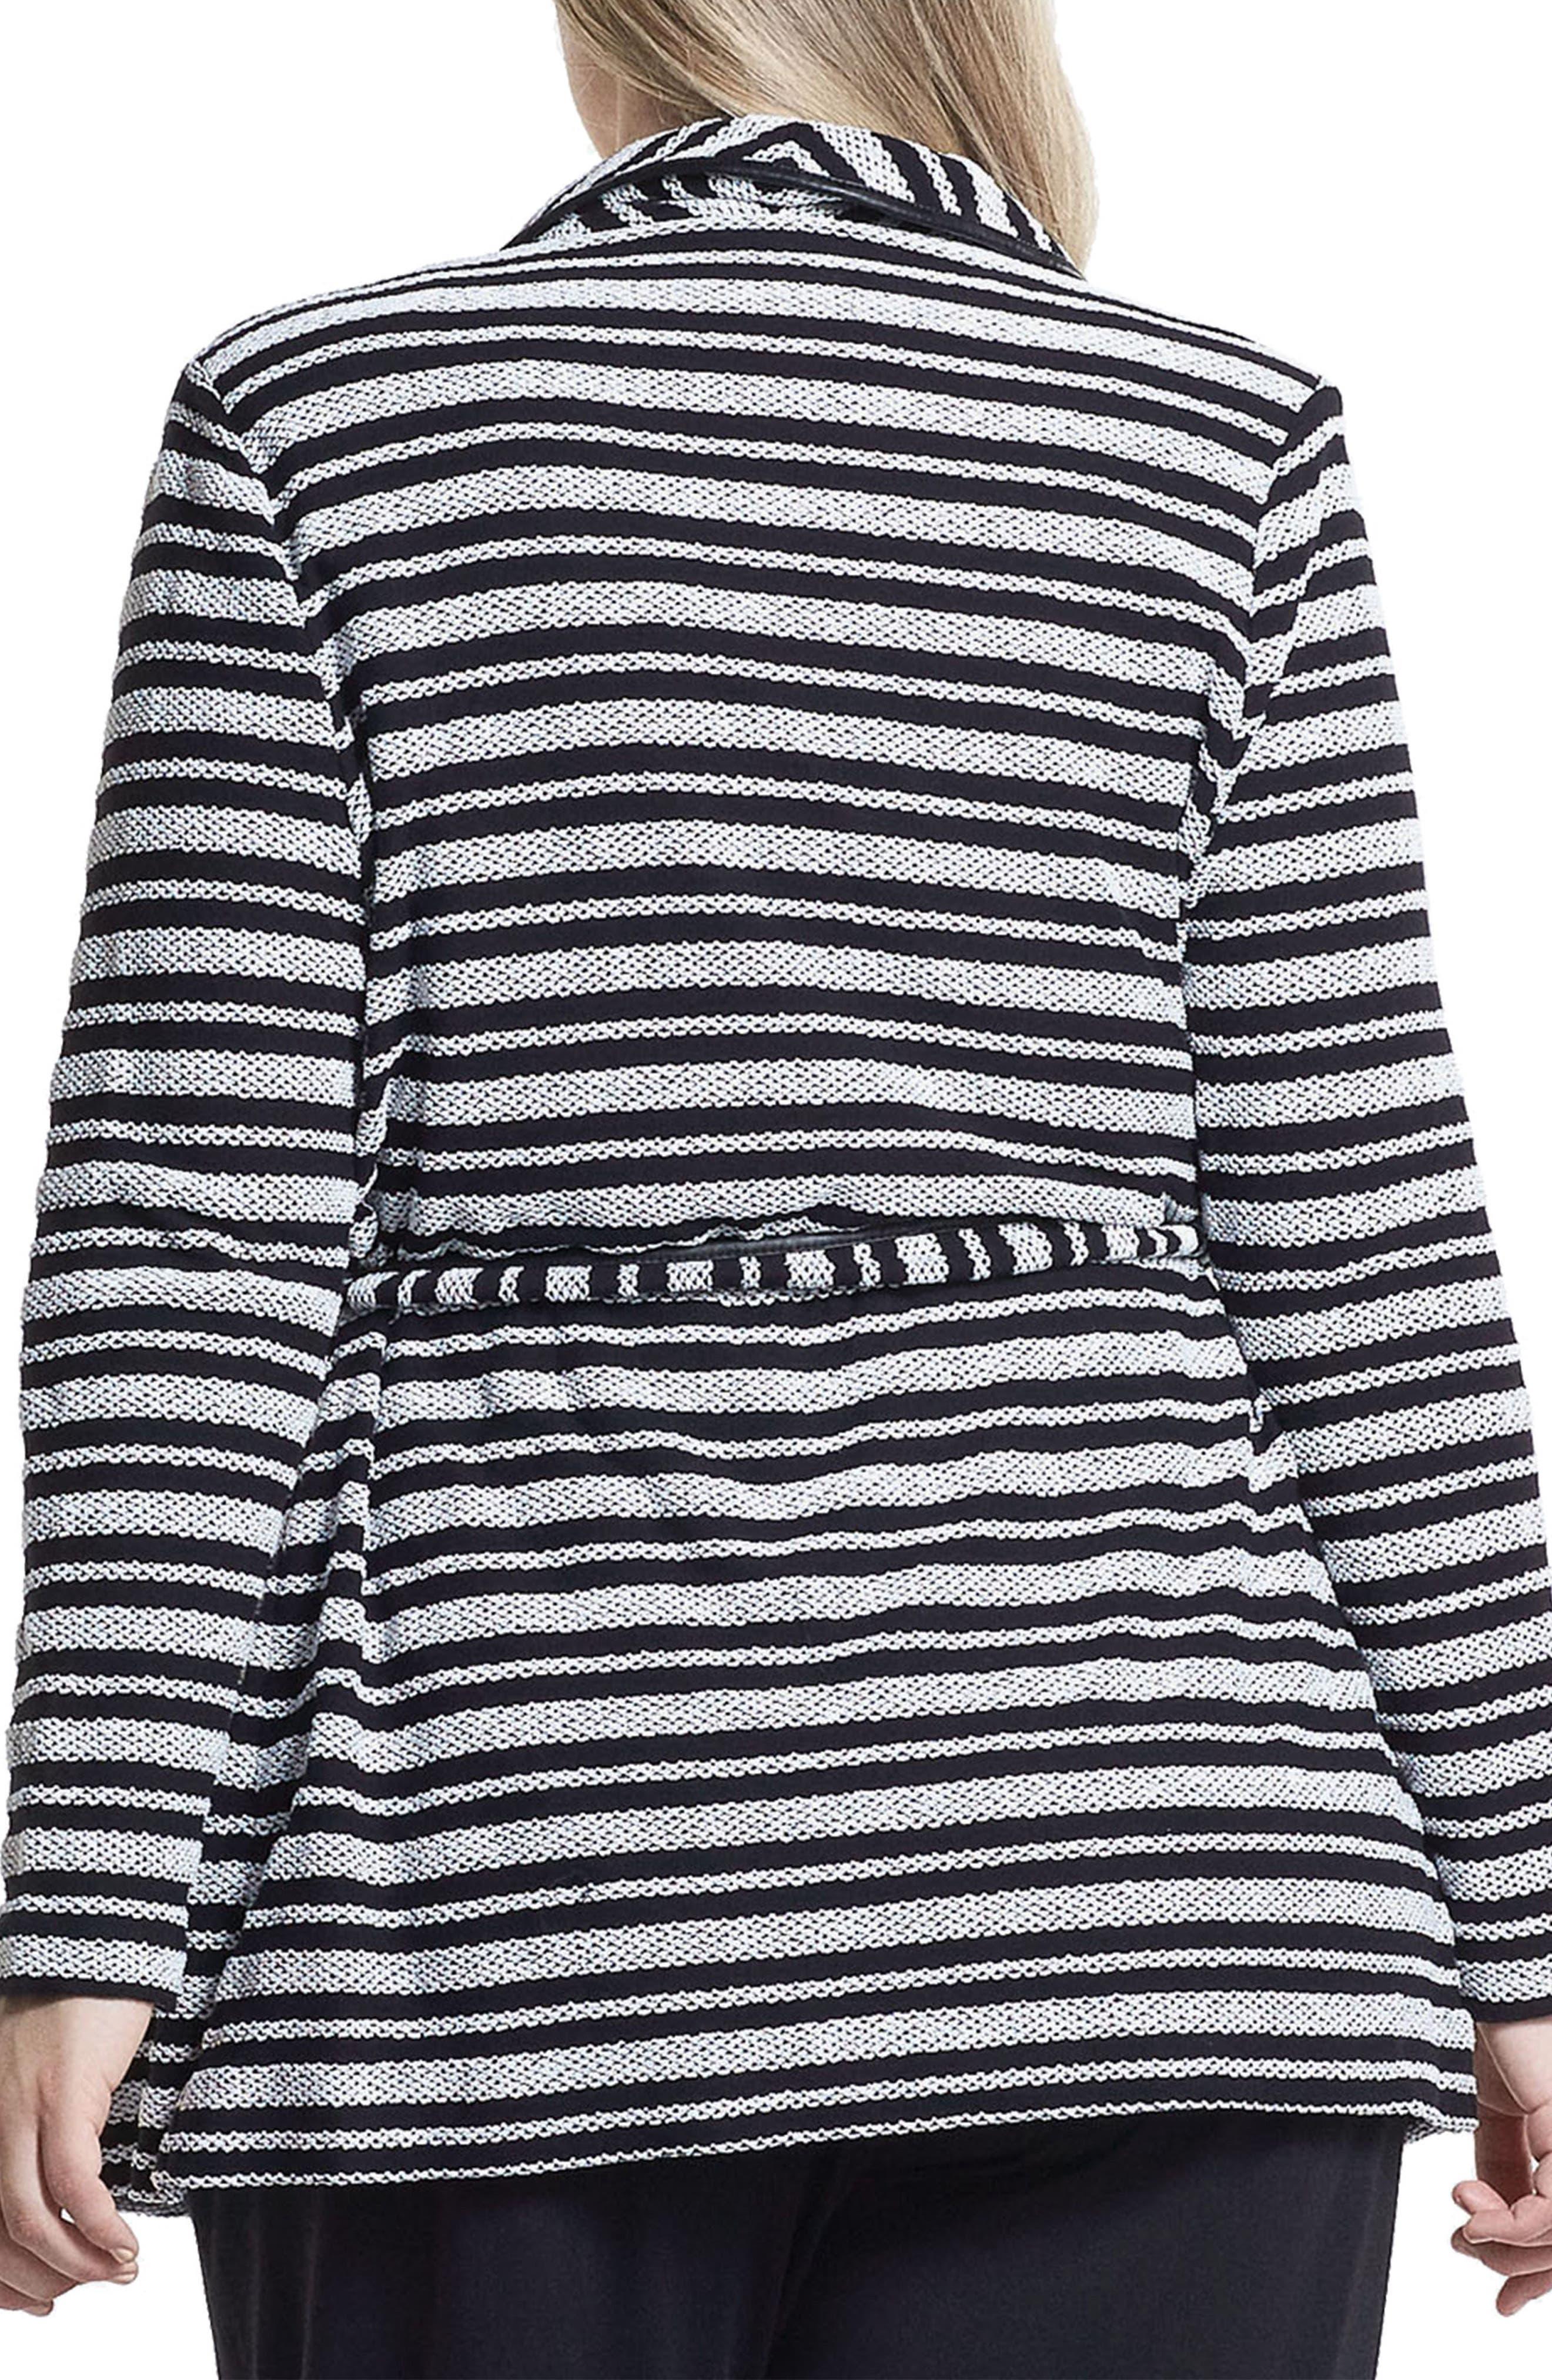 Xena Belted Stripe Knit Jacket,                             Alternate thumbnail 2, color,